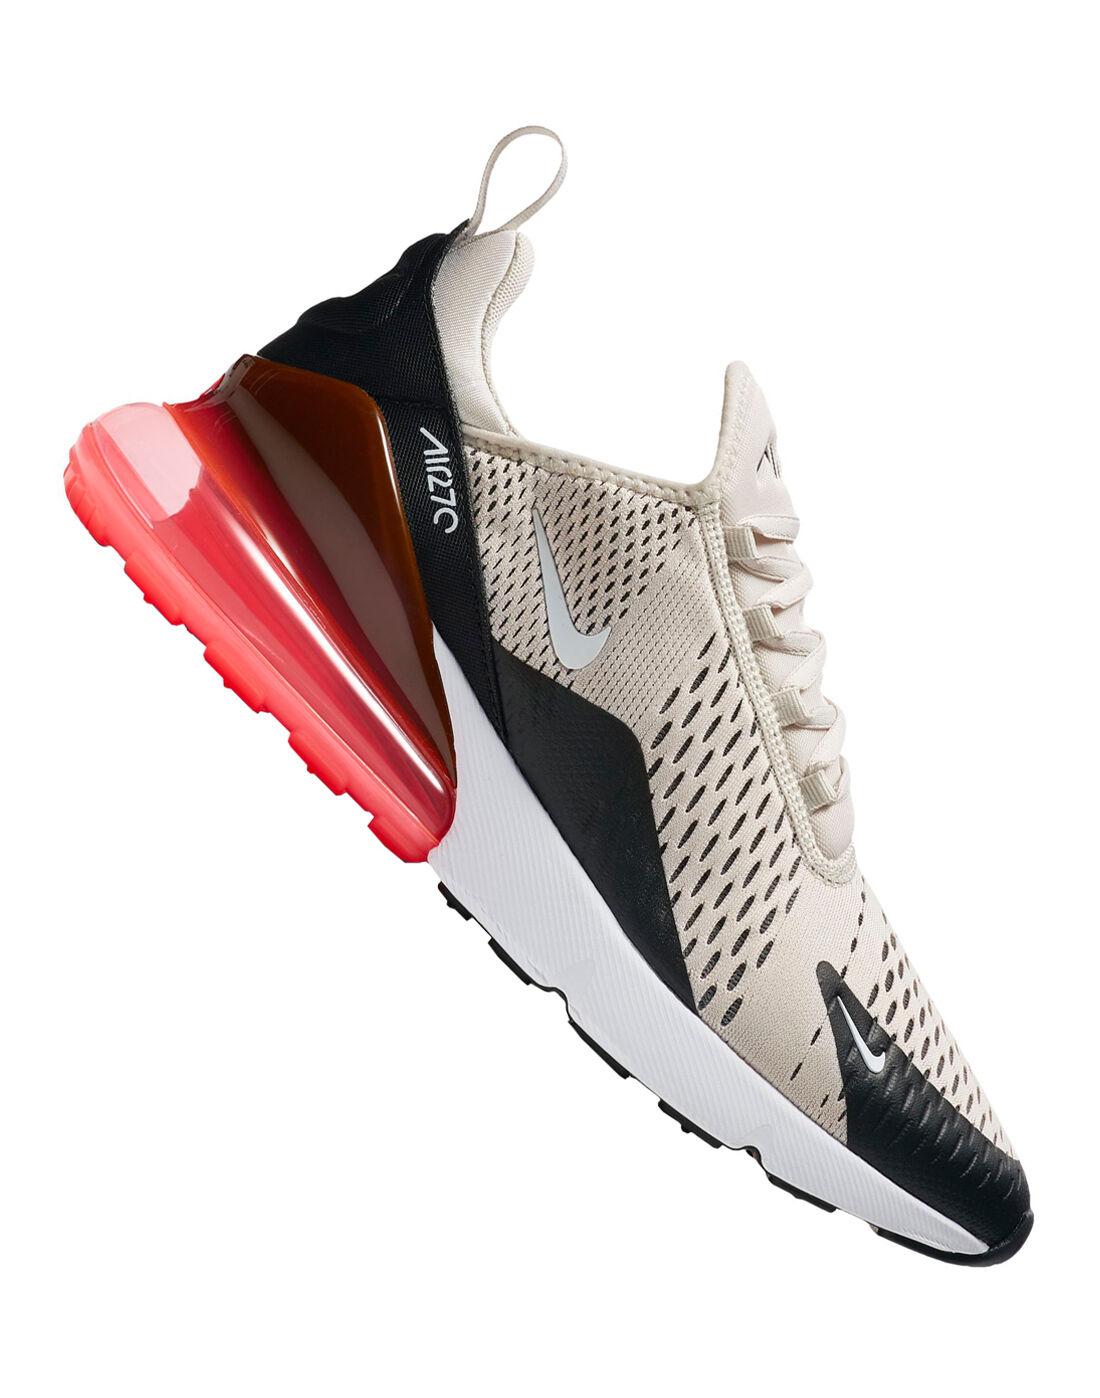 Men's Nike Air Max 270 Trainers | White